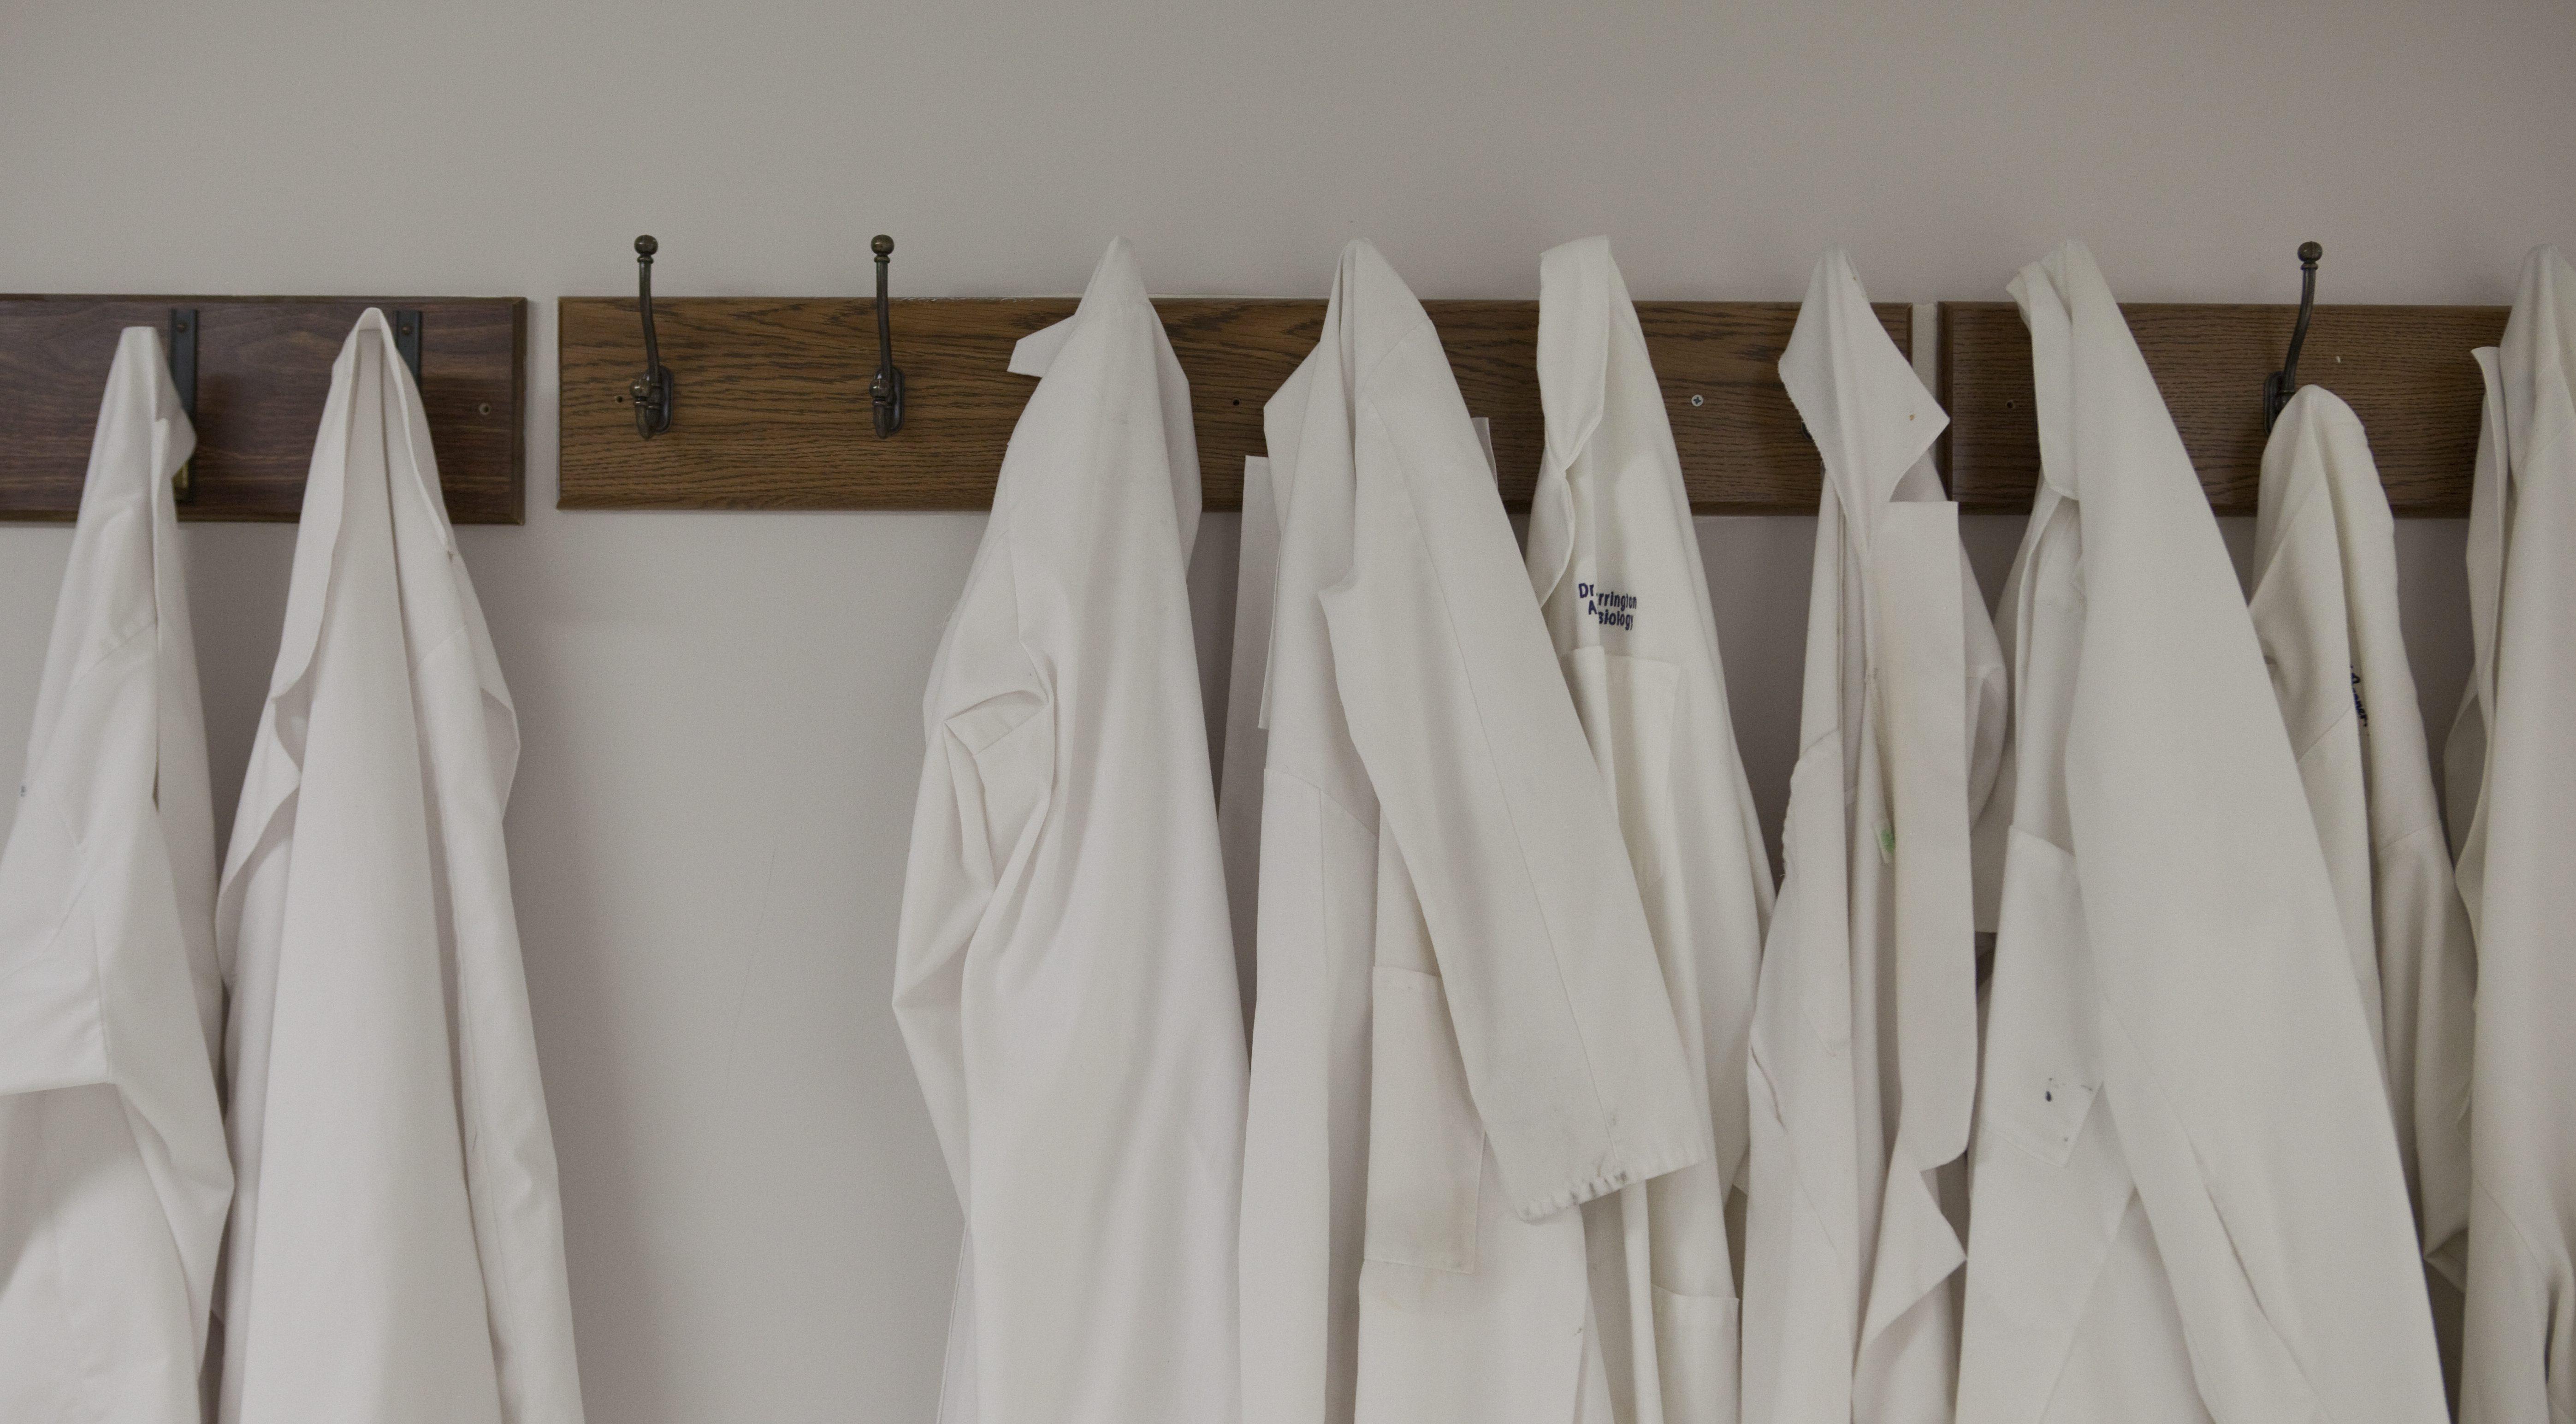 Lab coats hang outside the operating room at Washington Hospital Center on Friday, April  16, 2010 in Washington.